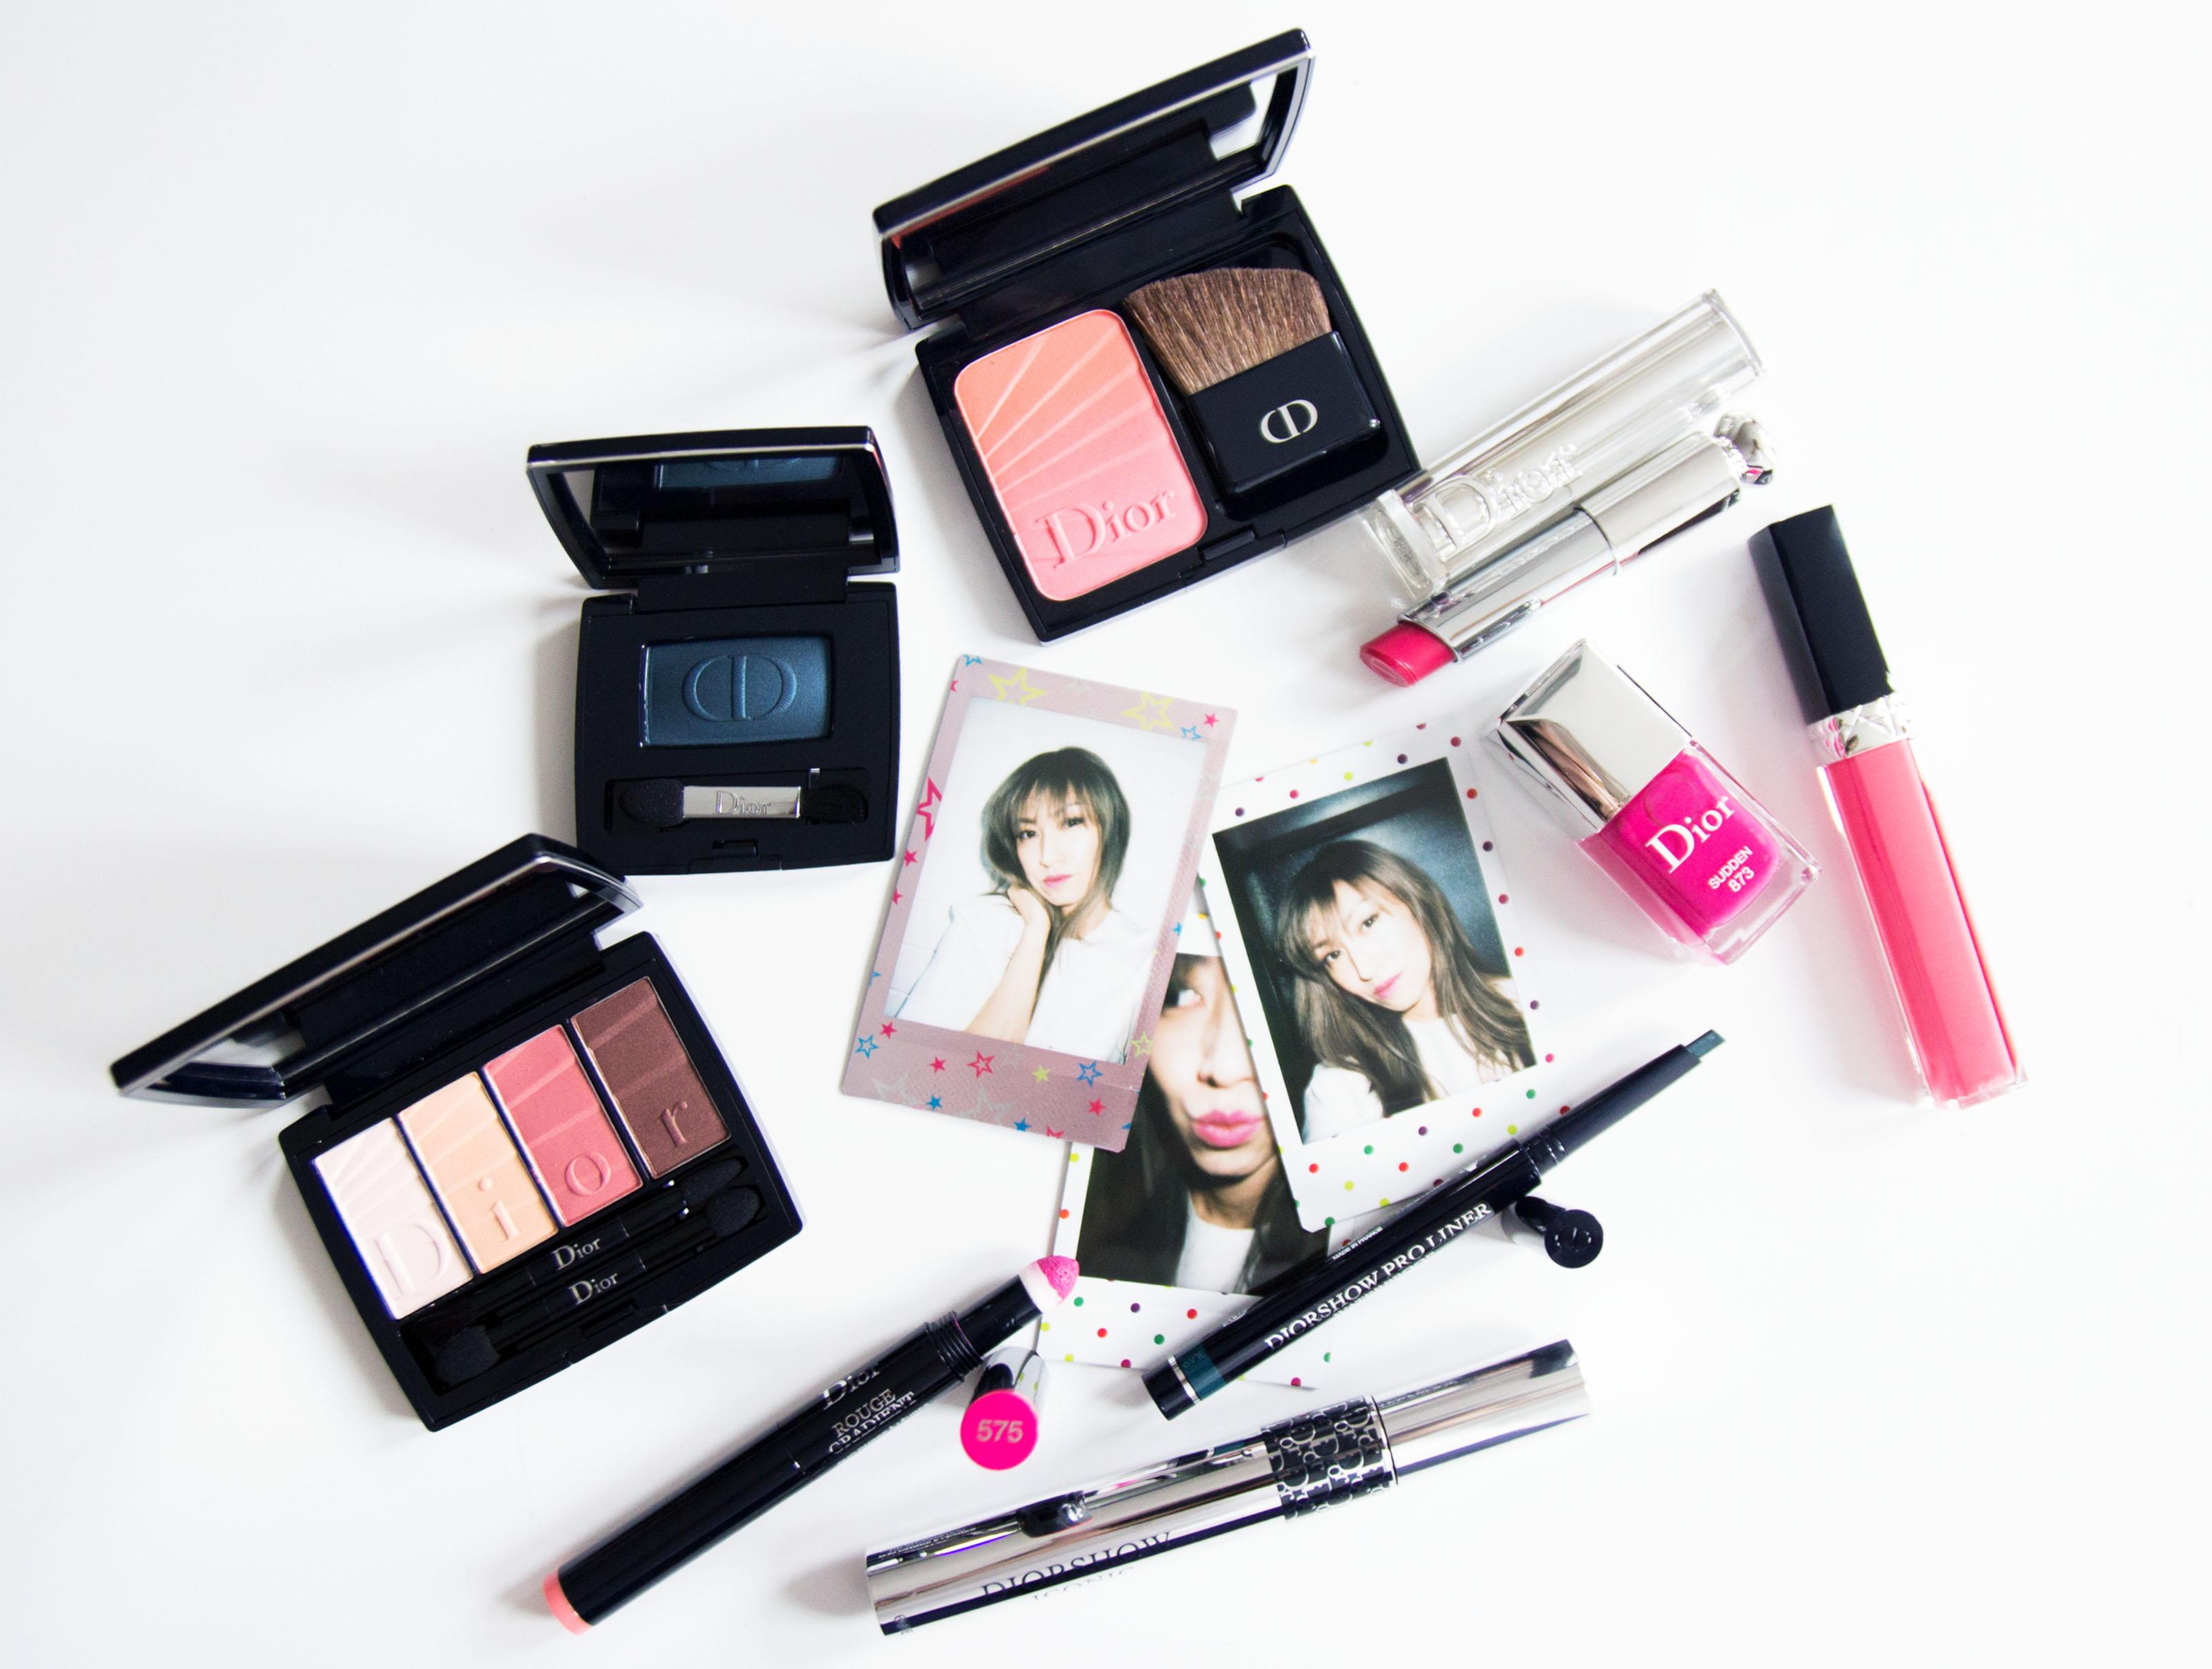 5fb85b24d2 Dior Makeup For Spring 2017 - Colour Gradation | Diva in Me